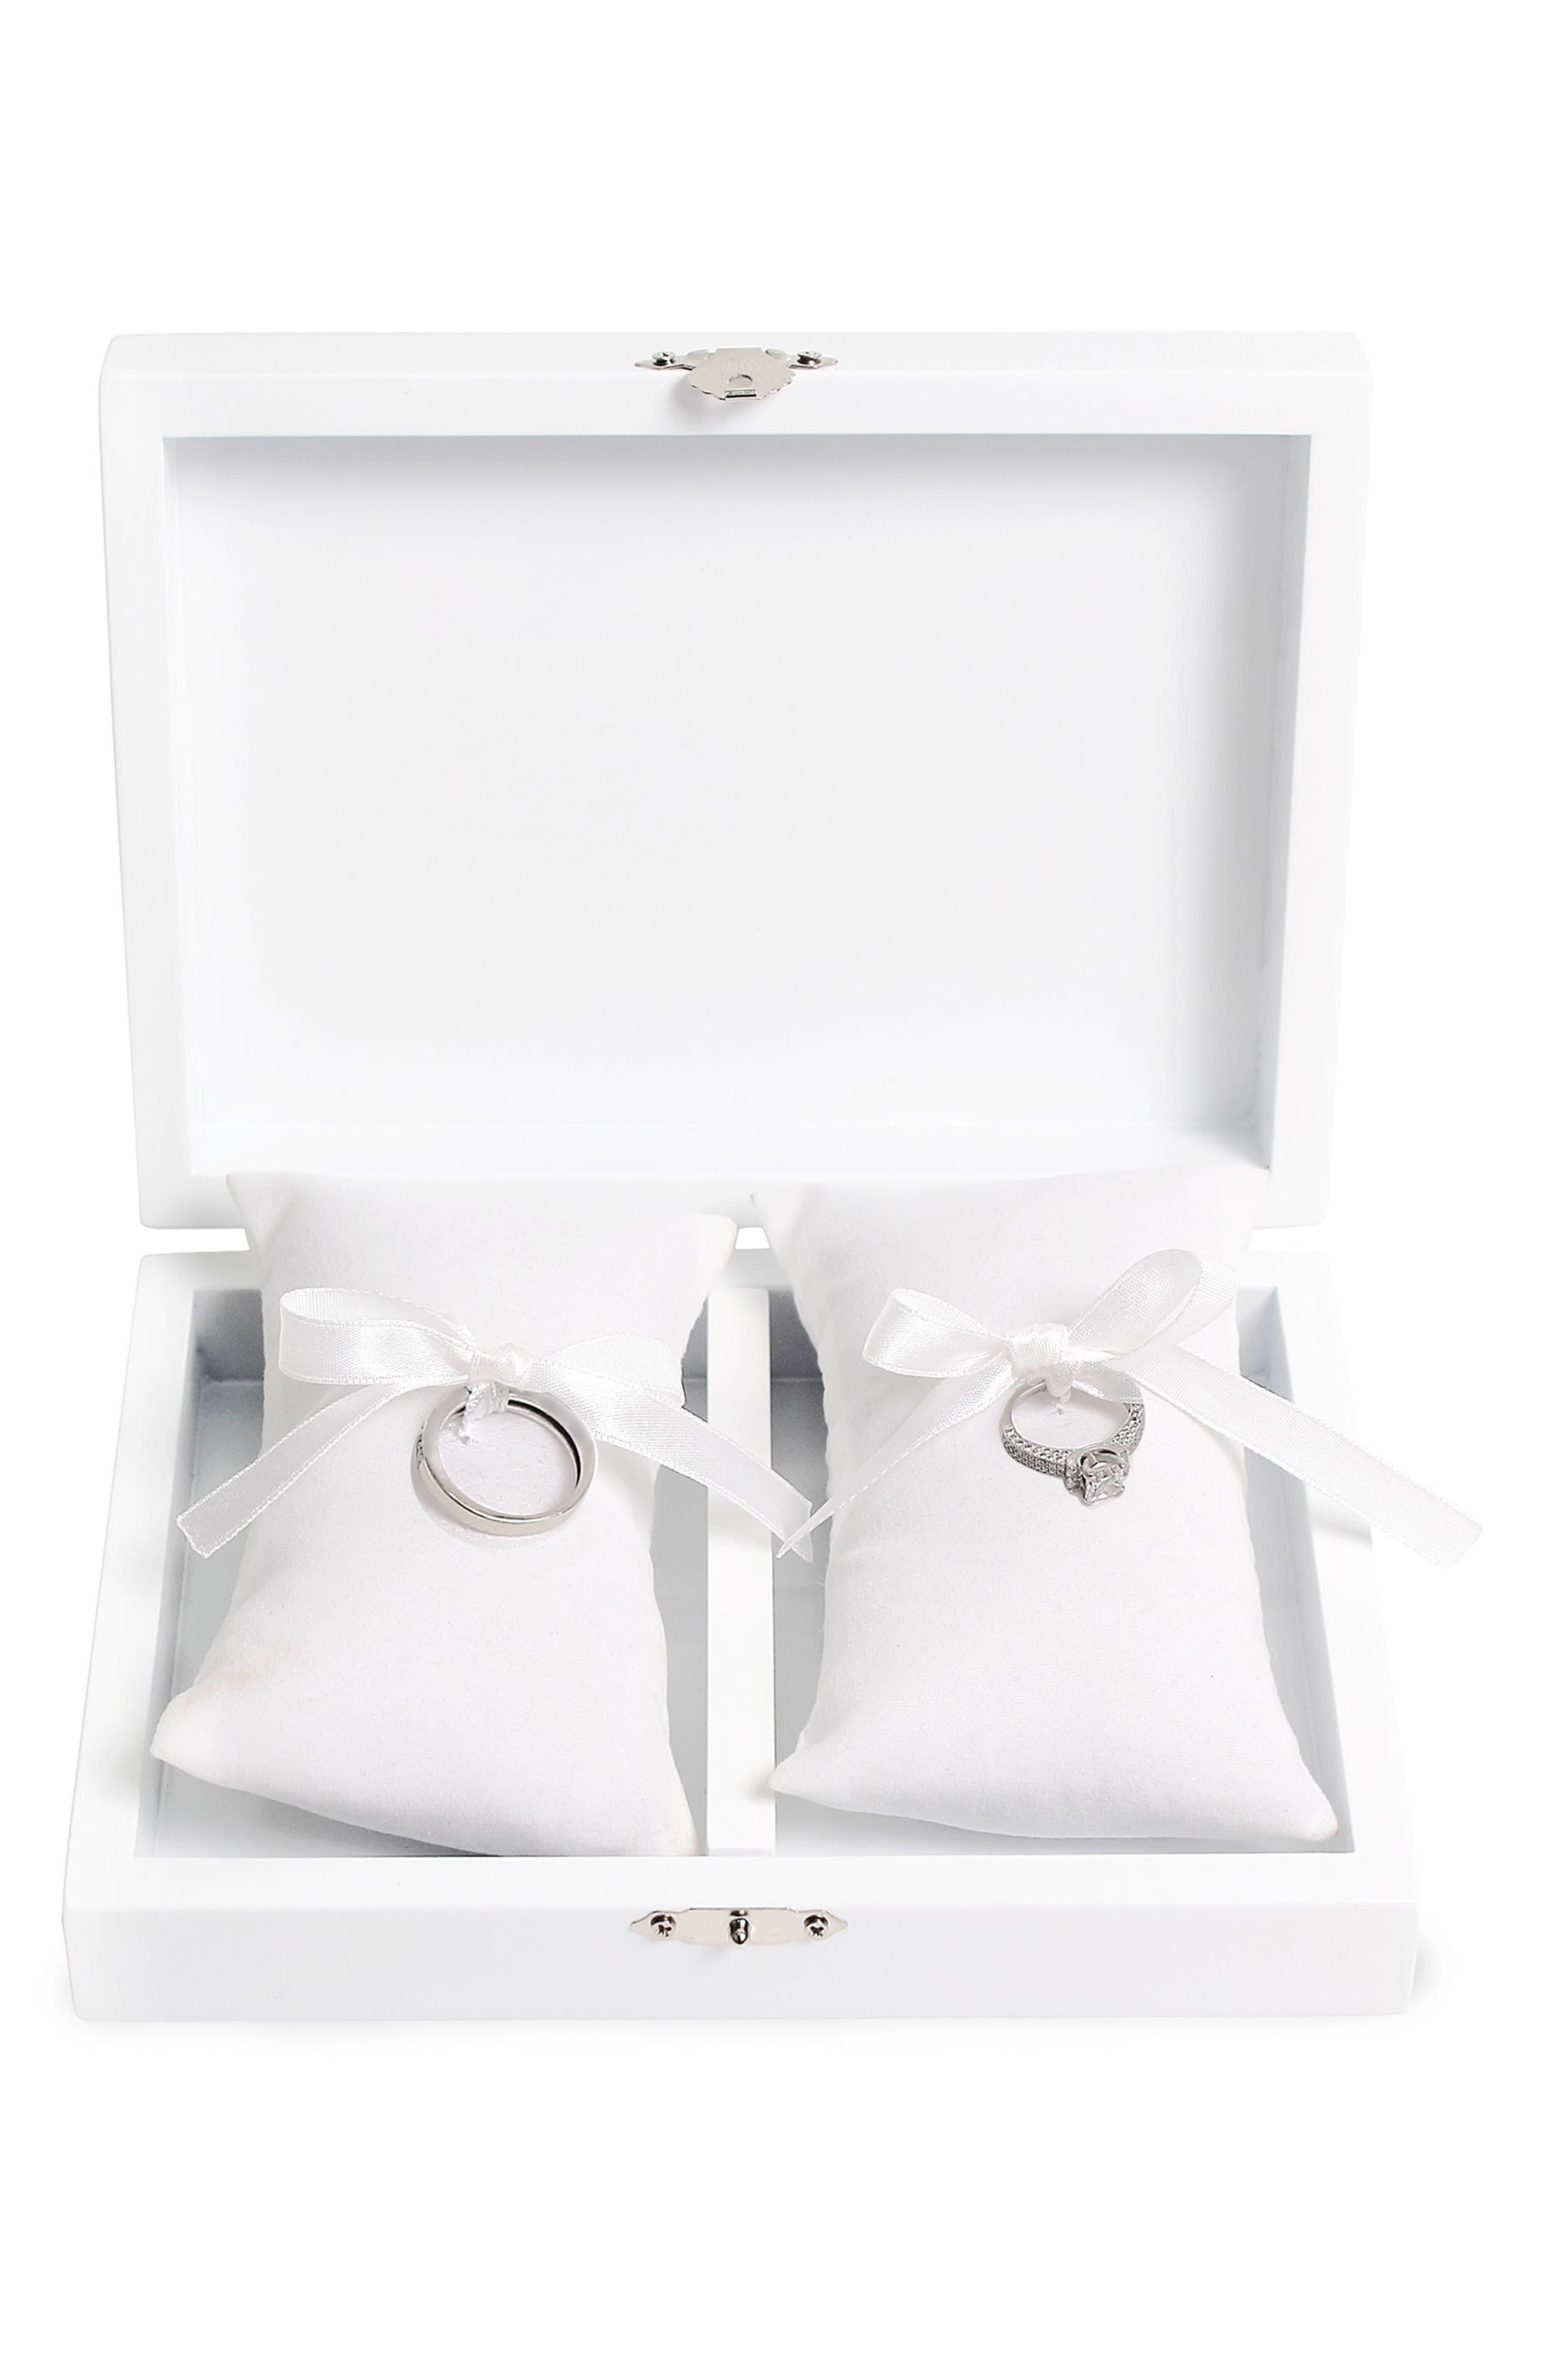 Monogram Floral Wedding Ring Box,                             Alternate thumbnail 27, color,